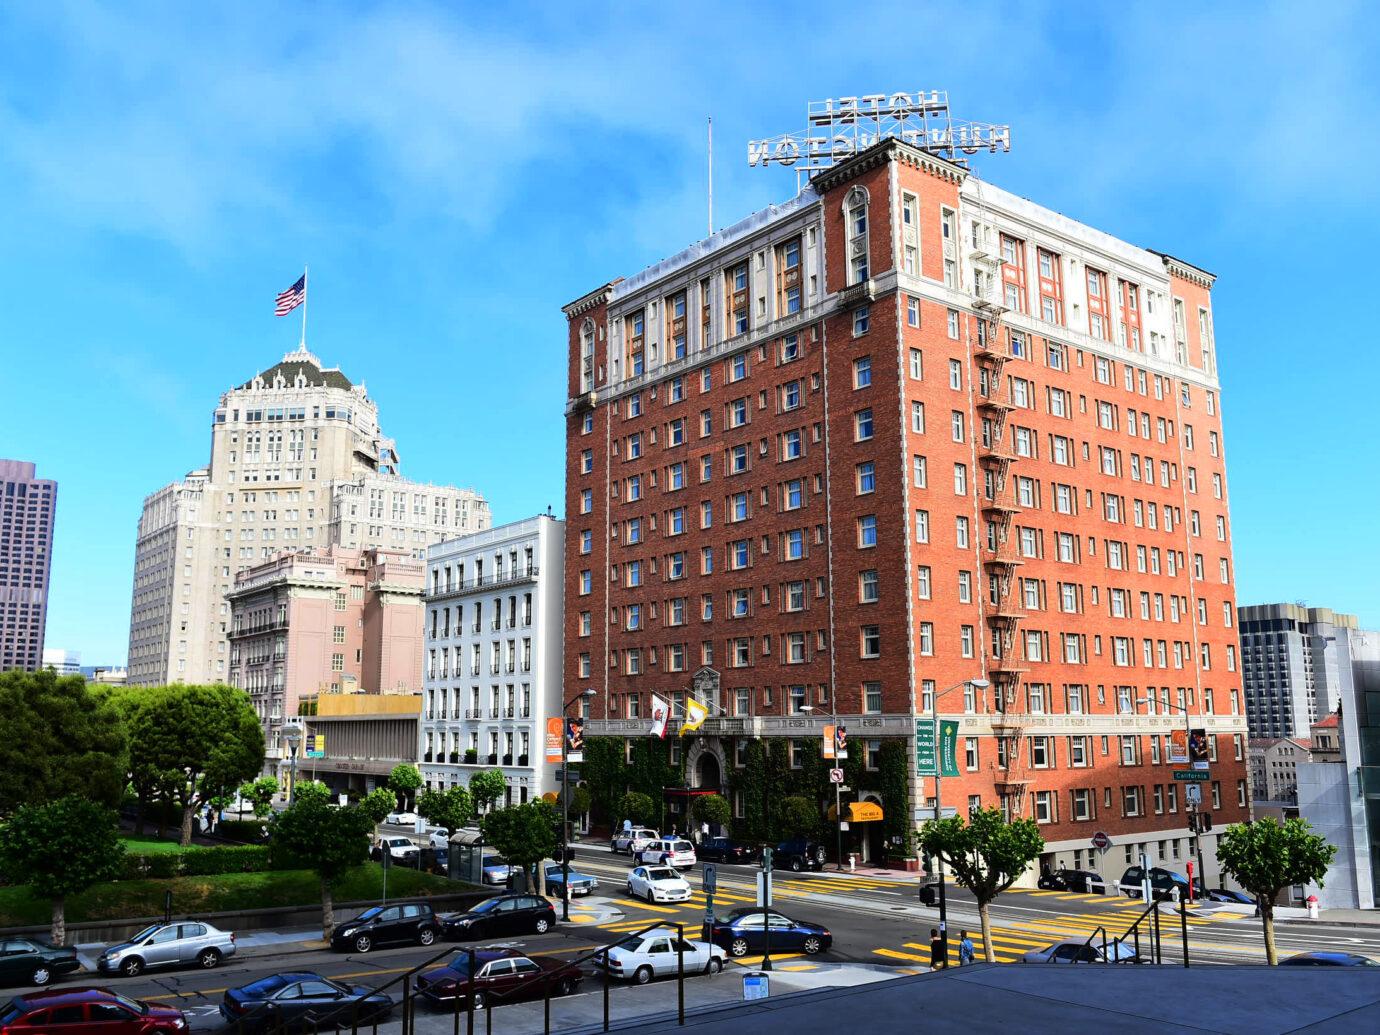 Exterior of The Huntington Hotel, San Francisco, CA